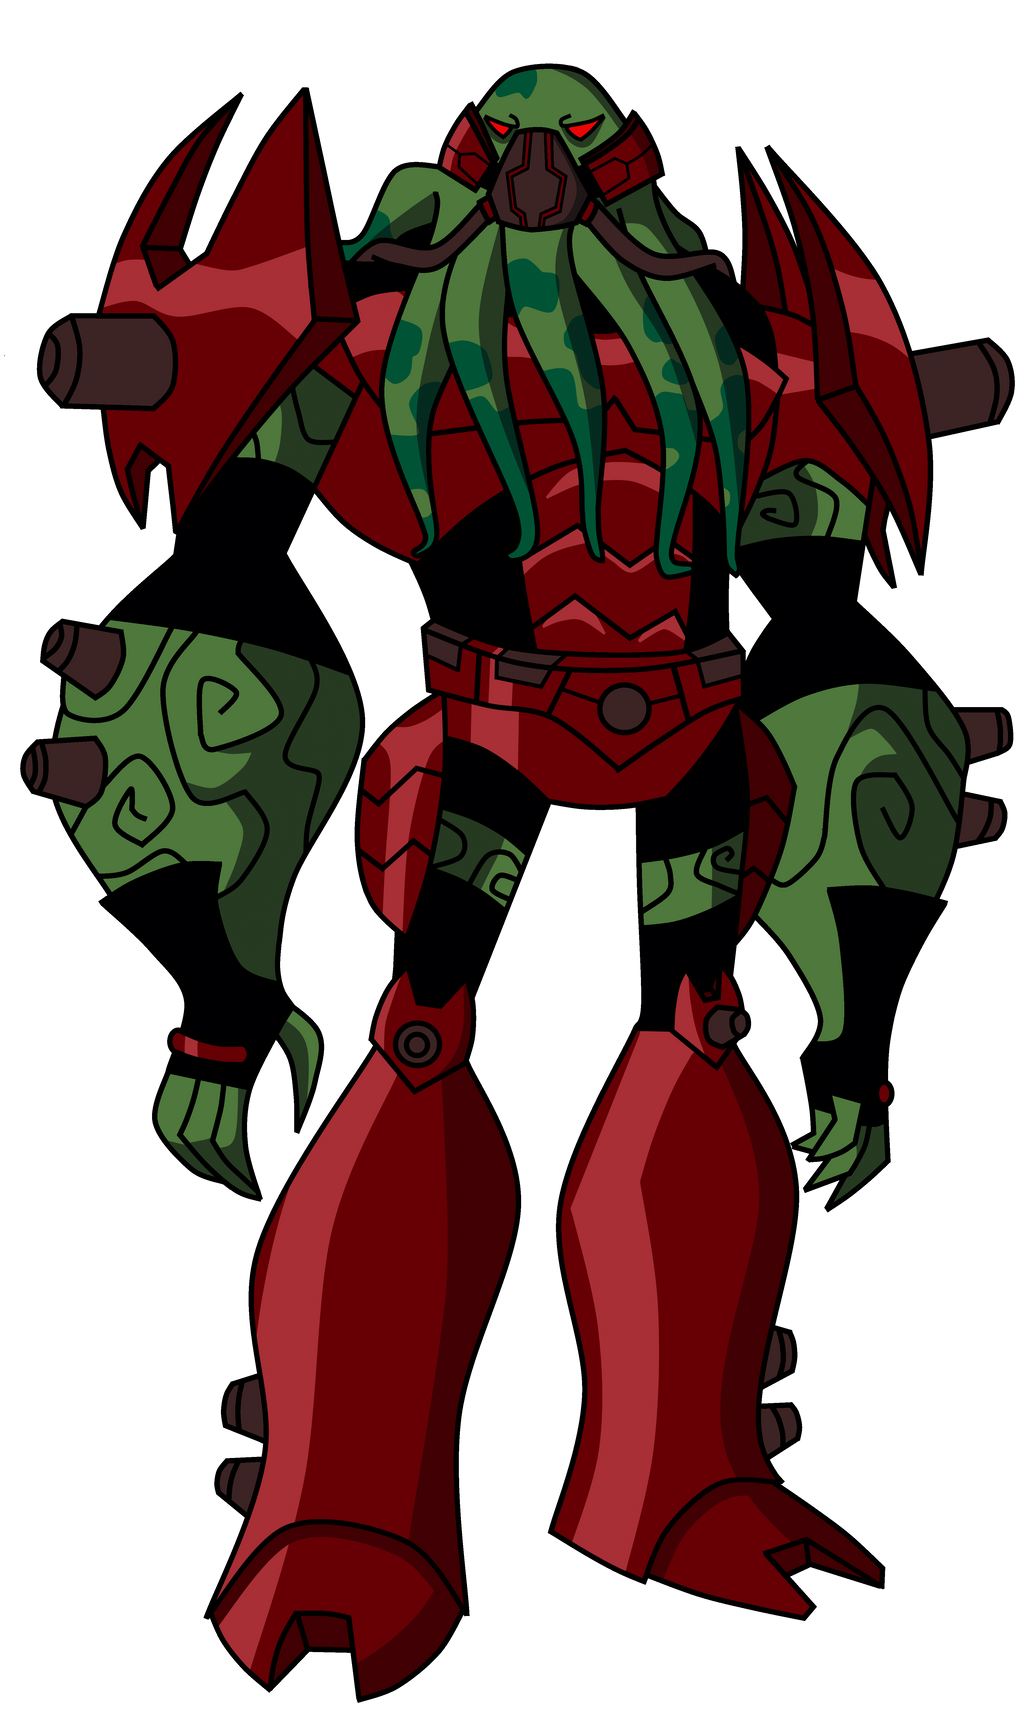 Ben 10: Alien Force -- Vilgax Attacks - IGN.com